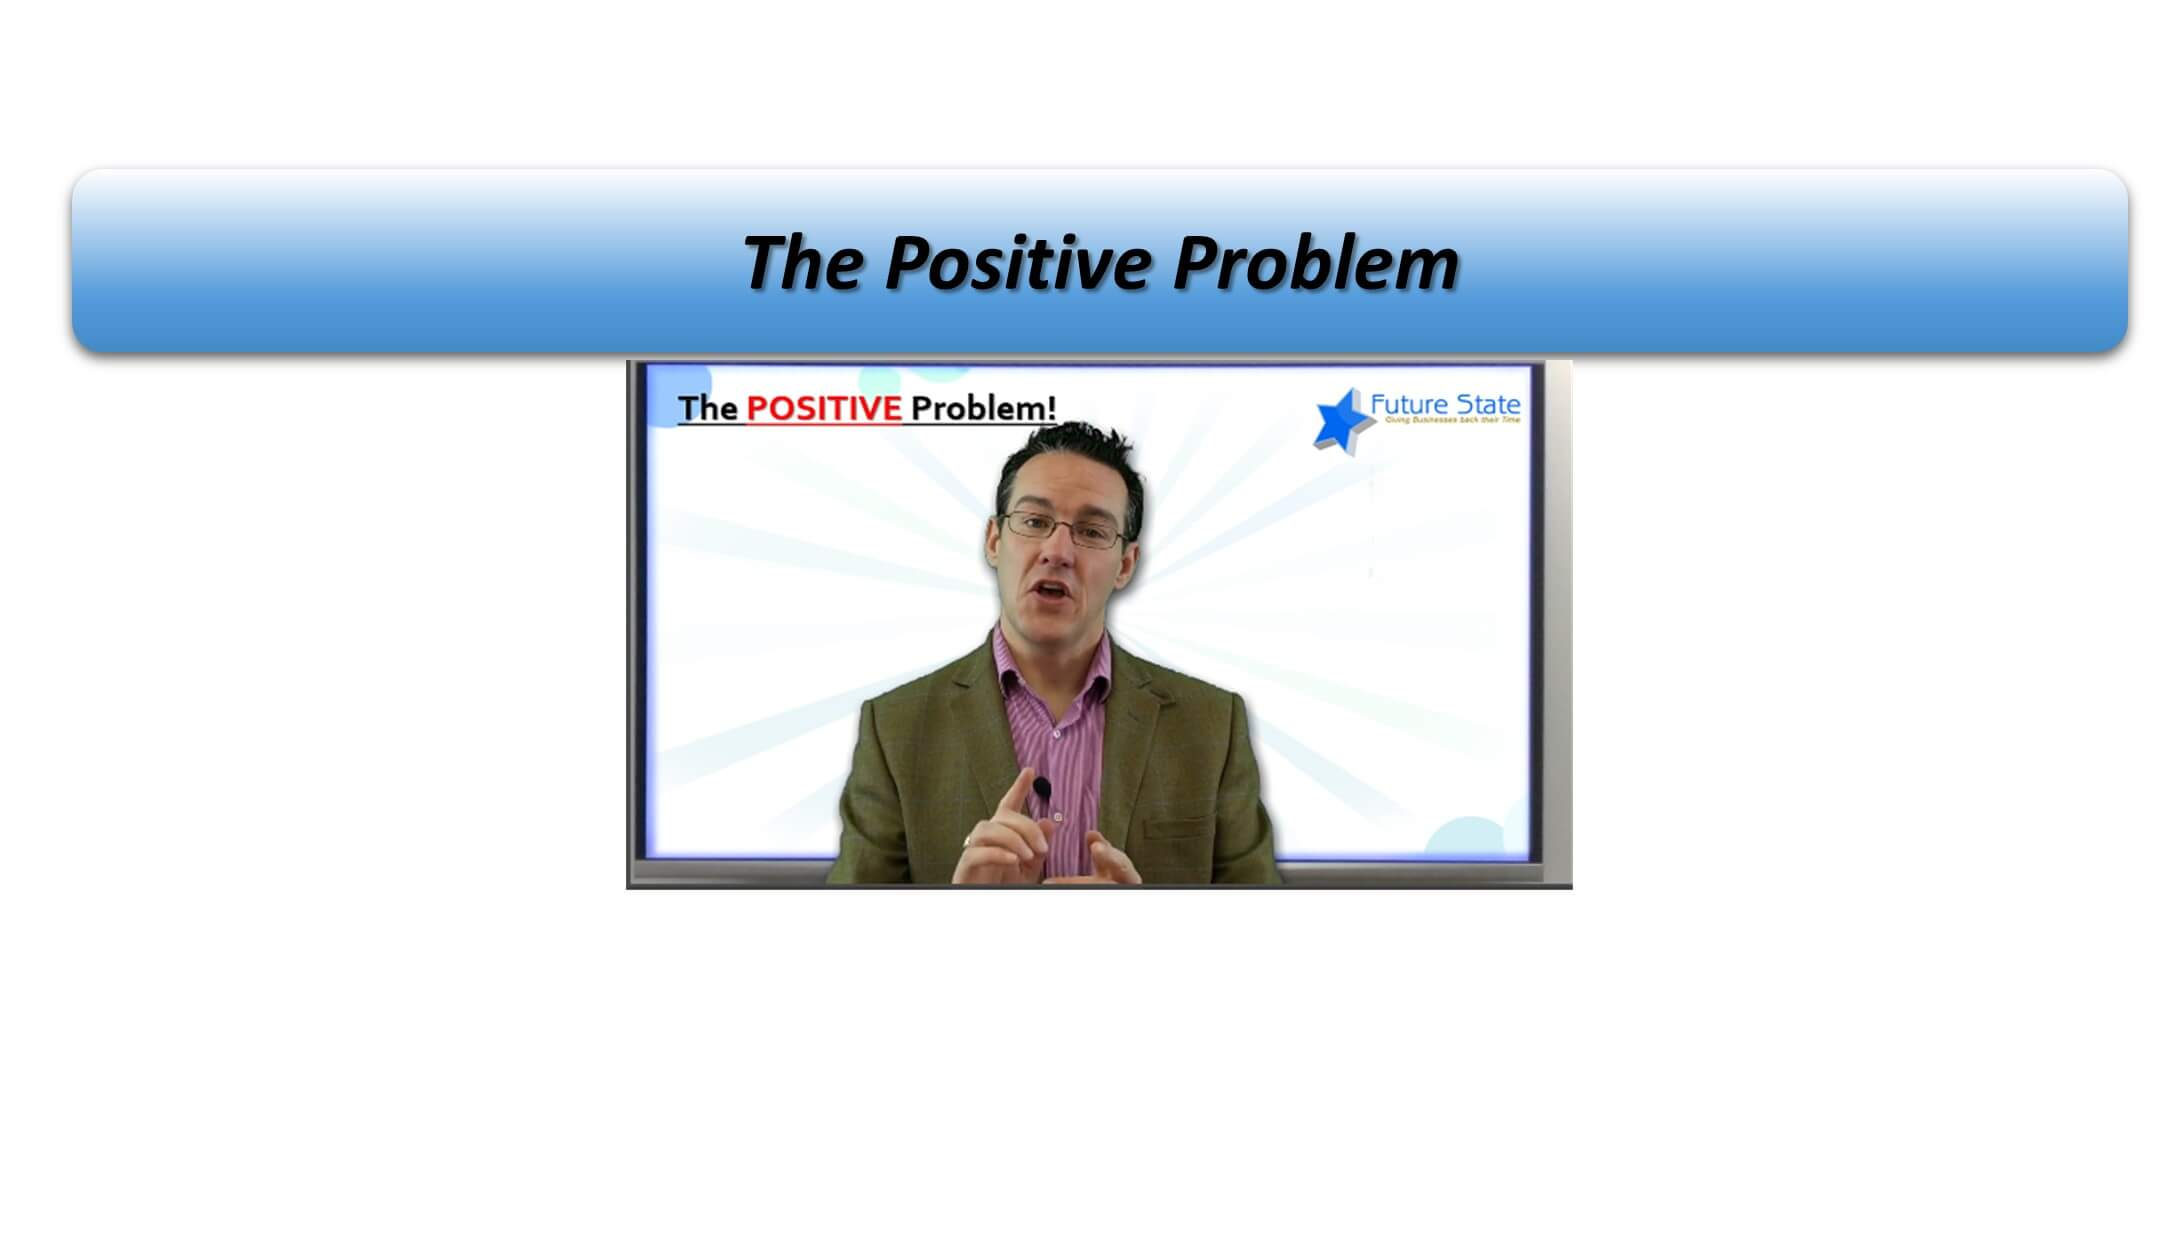 The Positive Problem